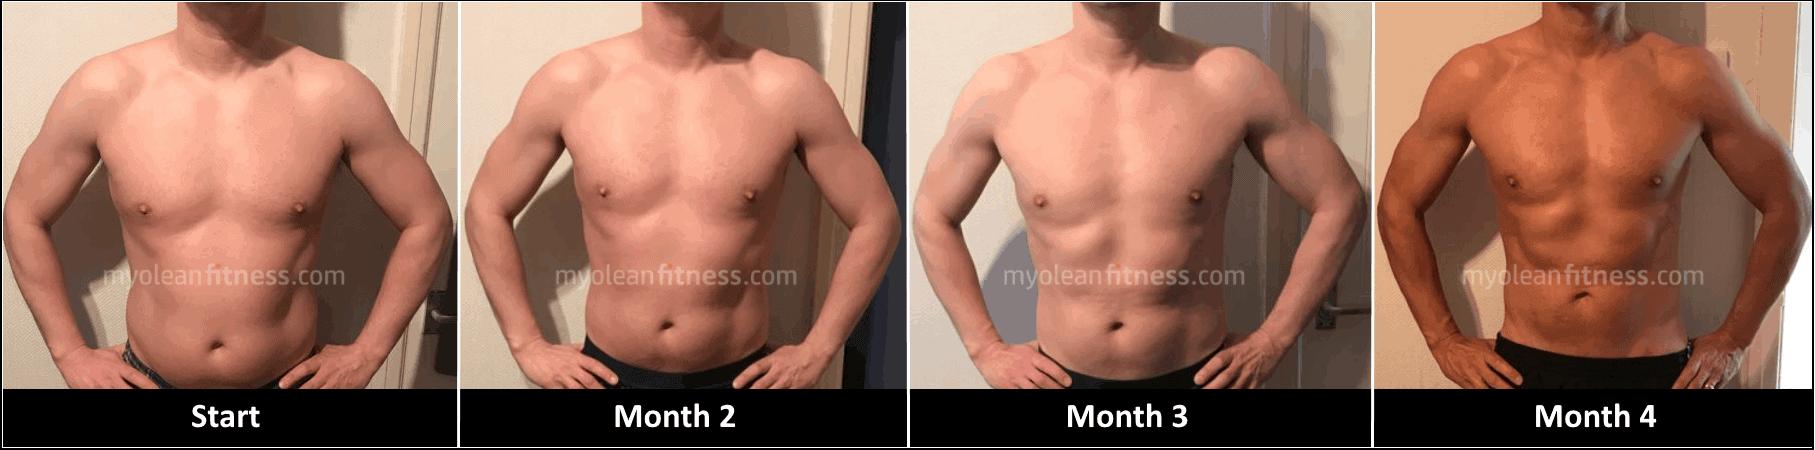 Ian's Fat Loss Transformation Progress - Myolean Fitness